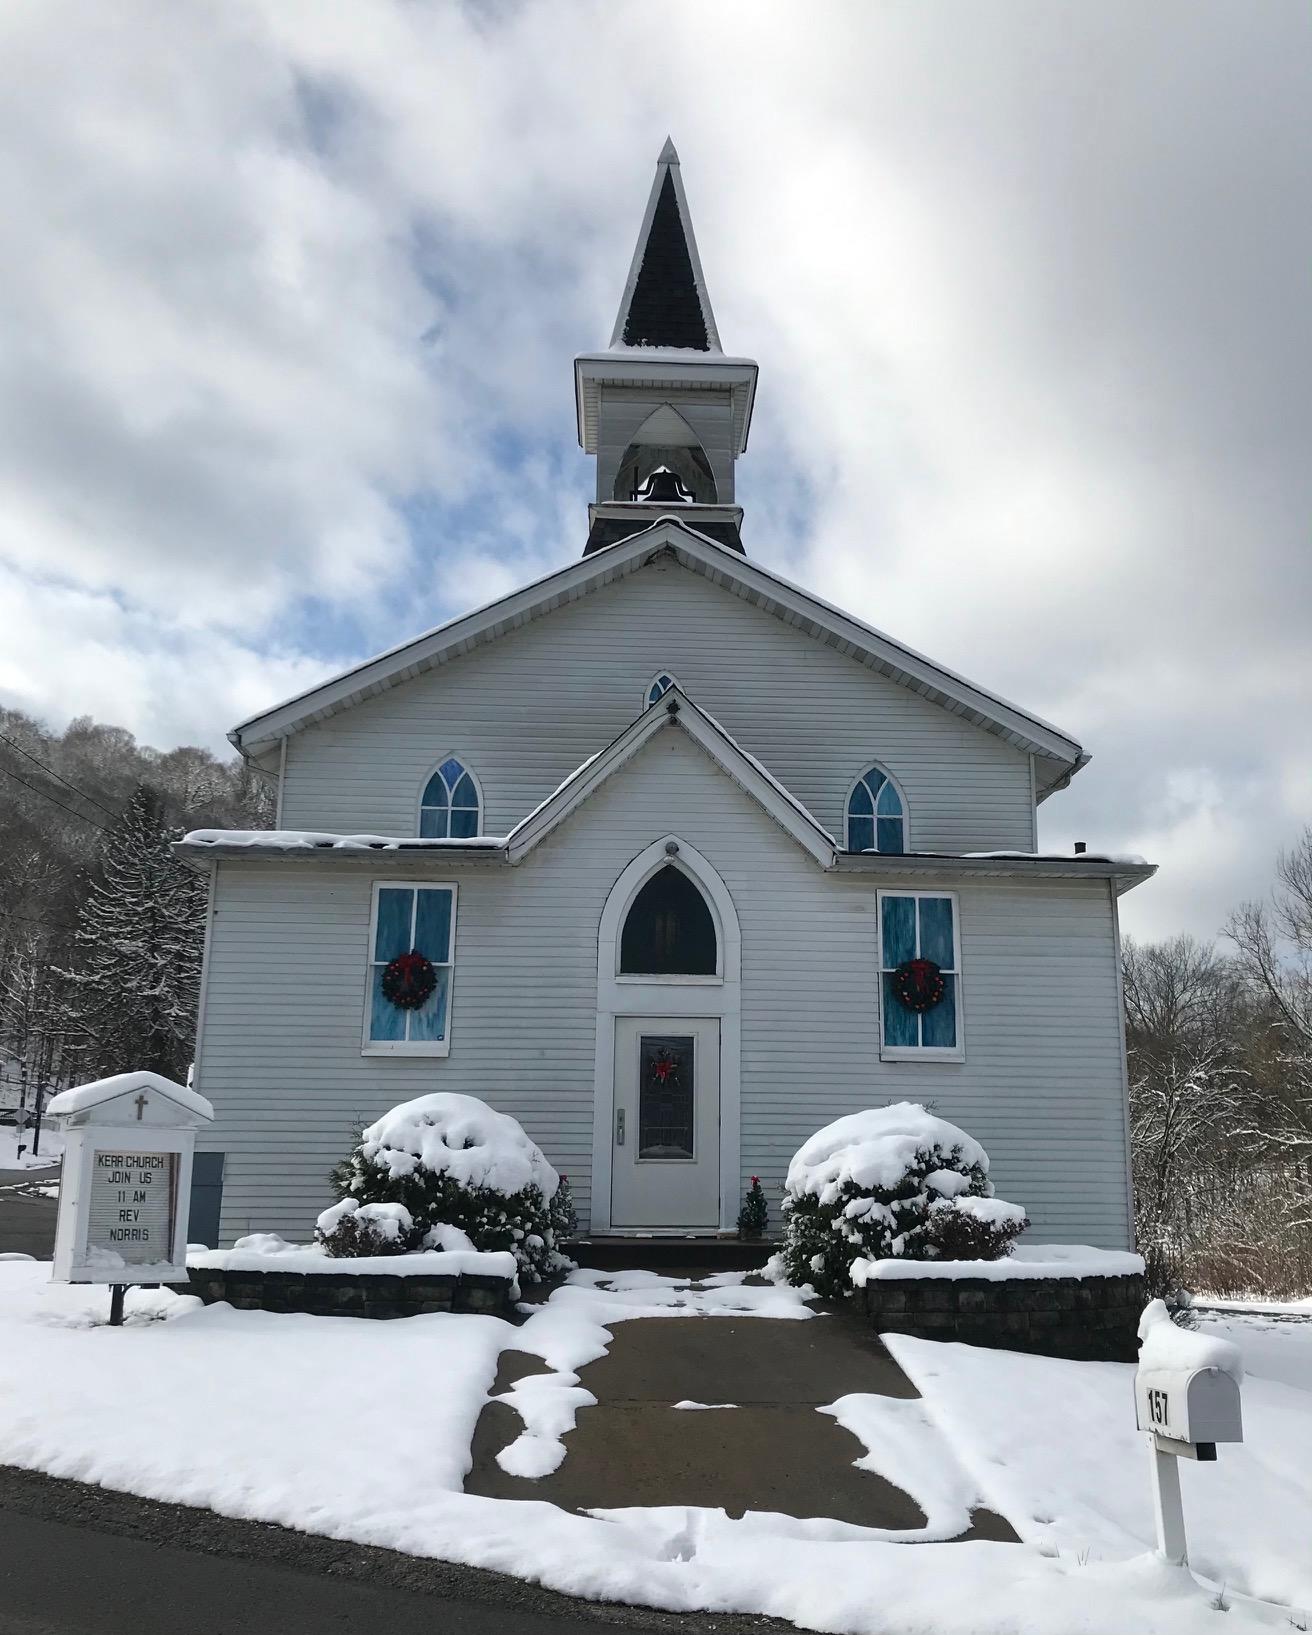 Kerr Presbyterian Church in the snow, Carrie Nery